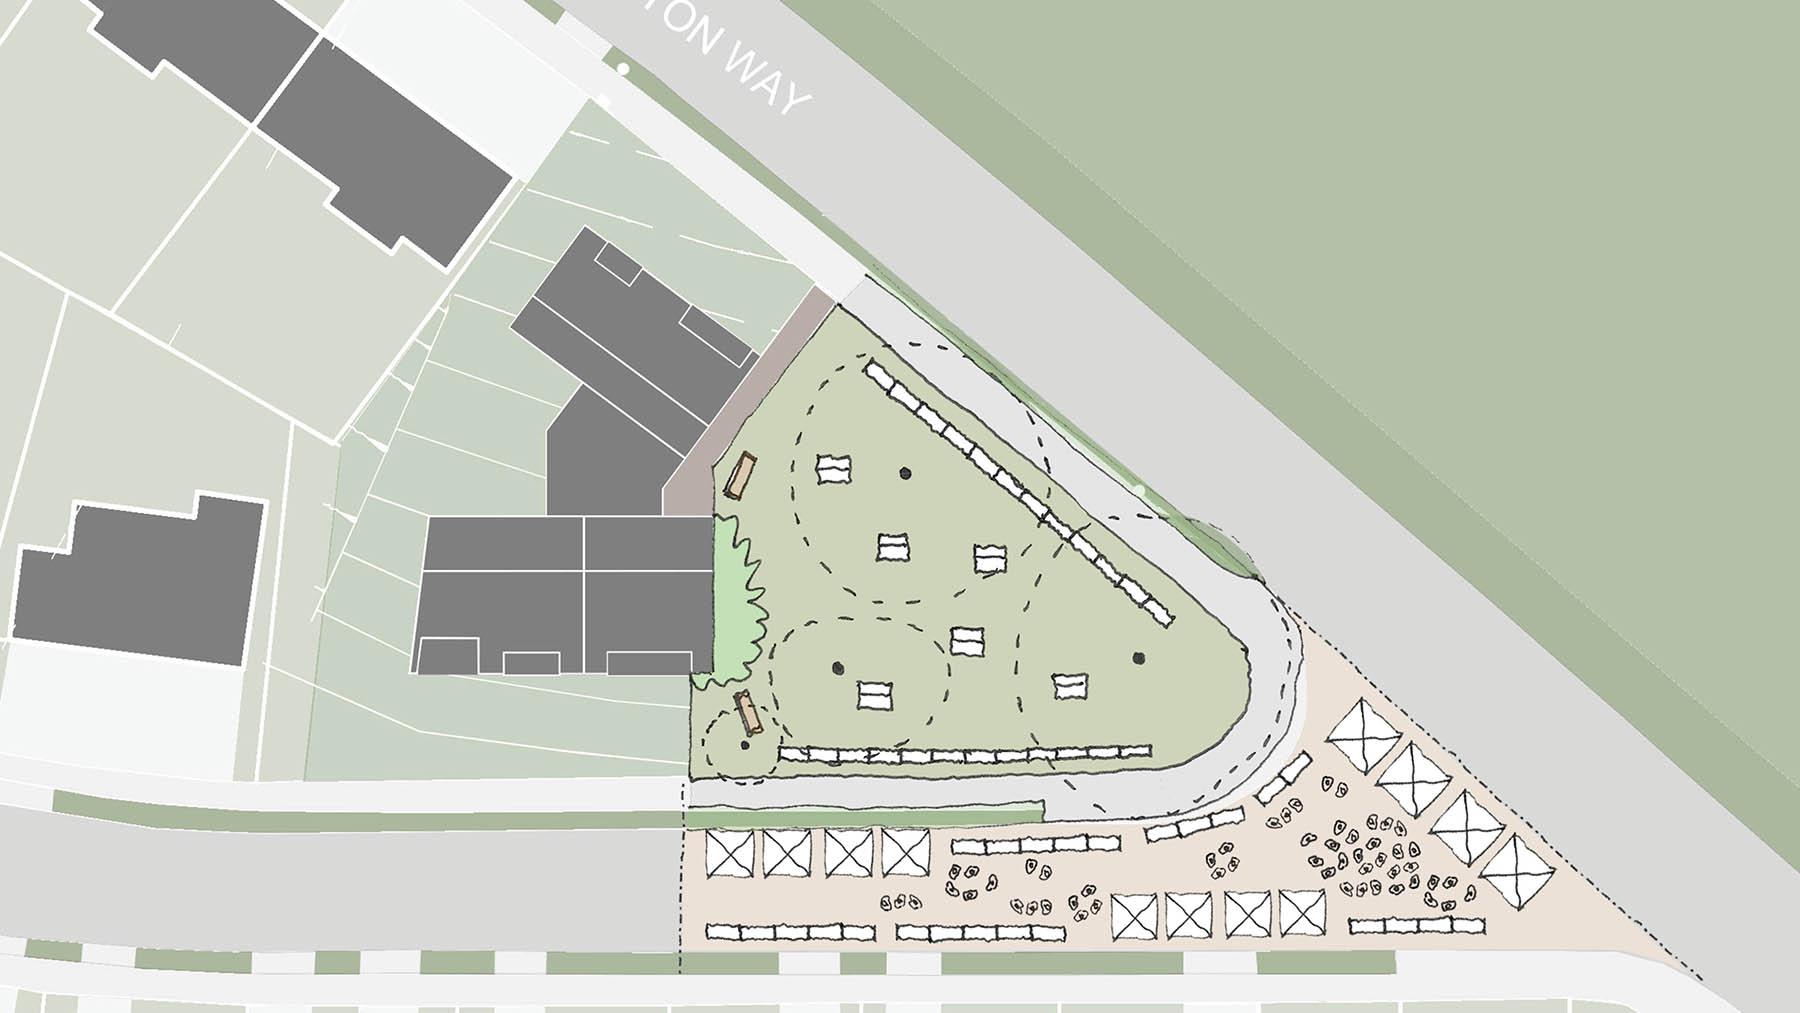 Sarah Wigglesworth Architects Covington Court Slideshow Public Use Sketch 8